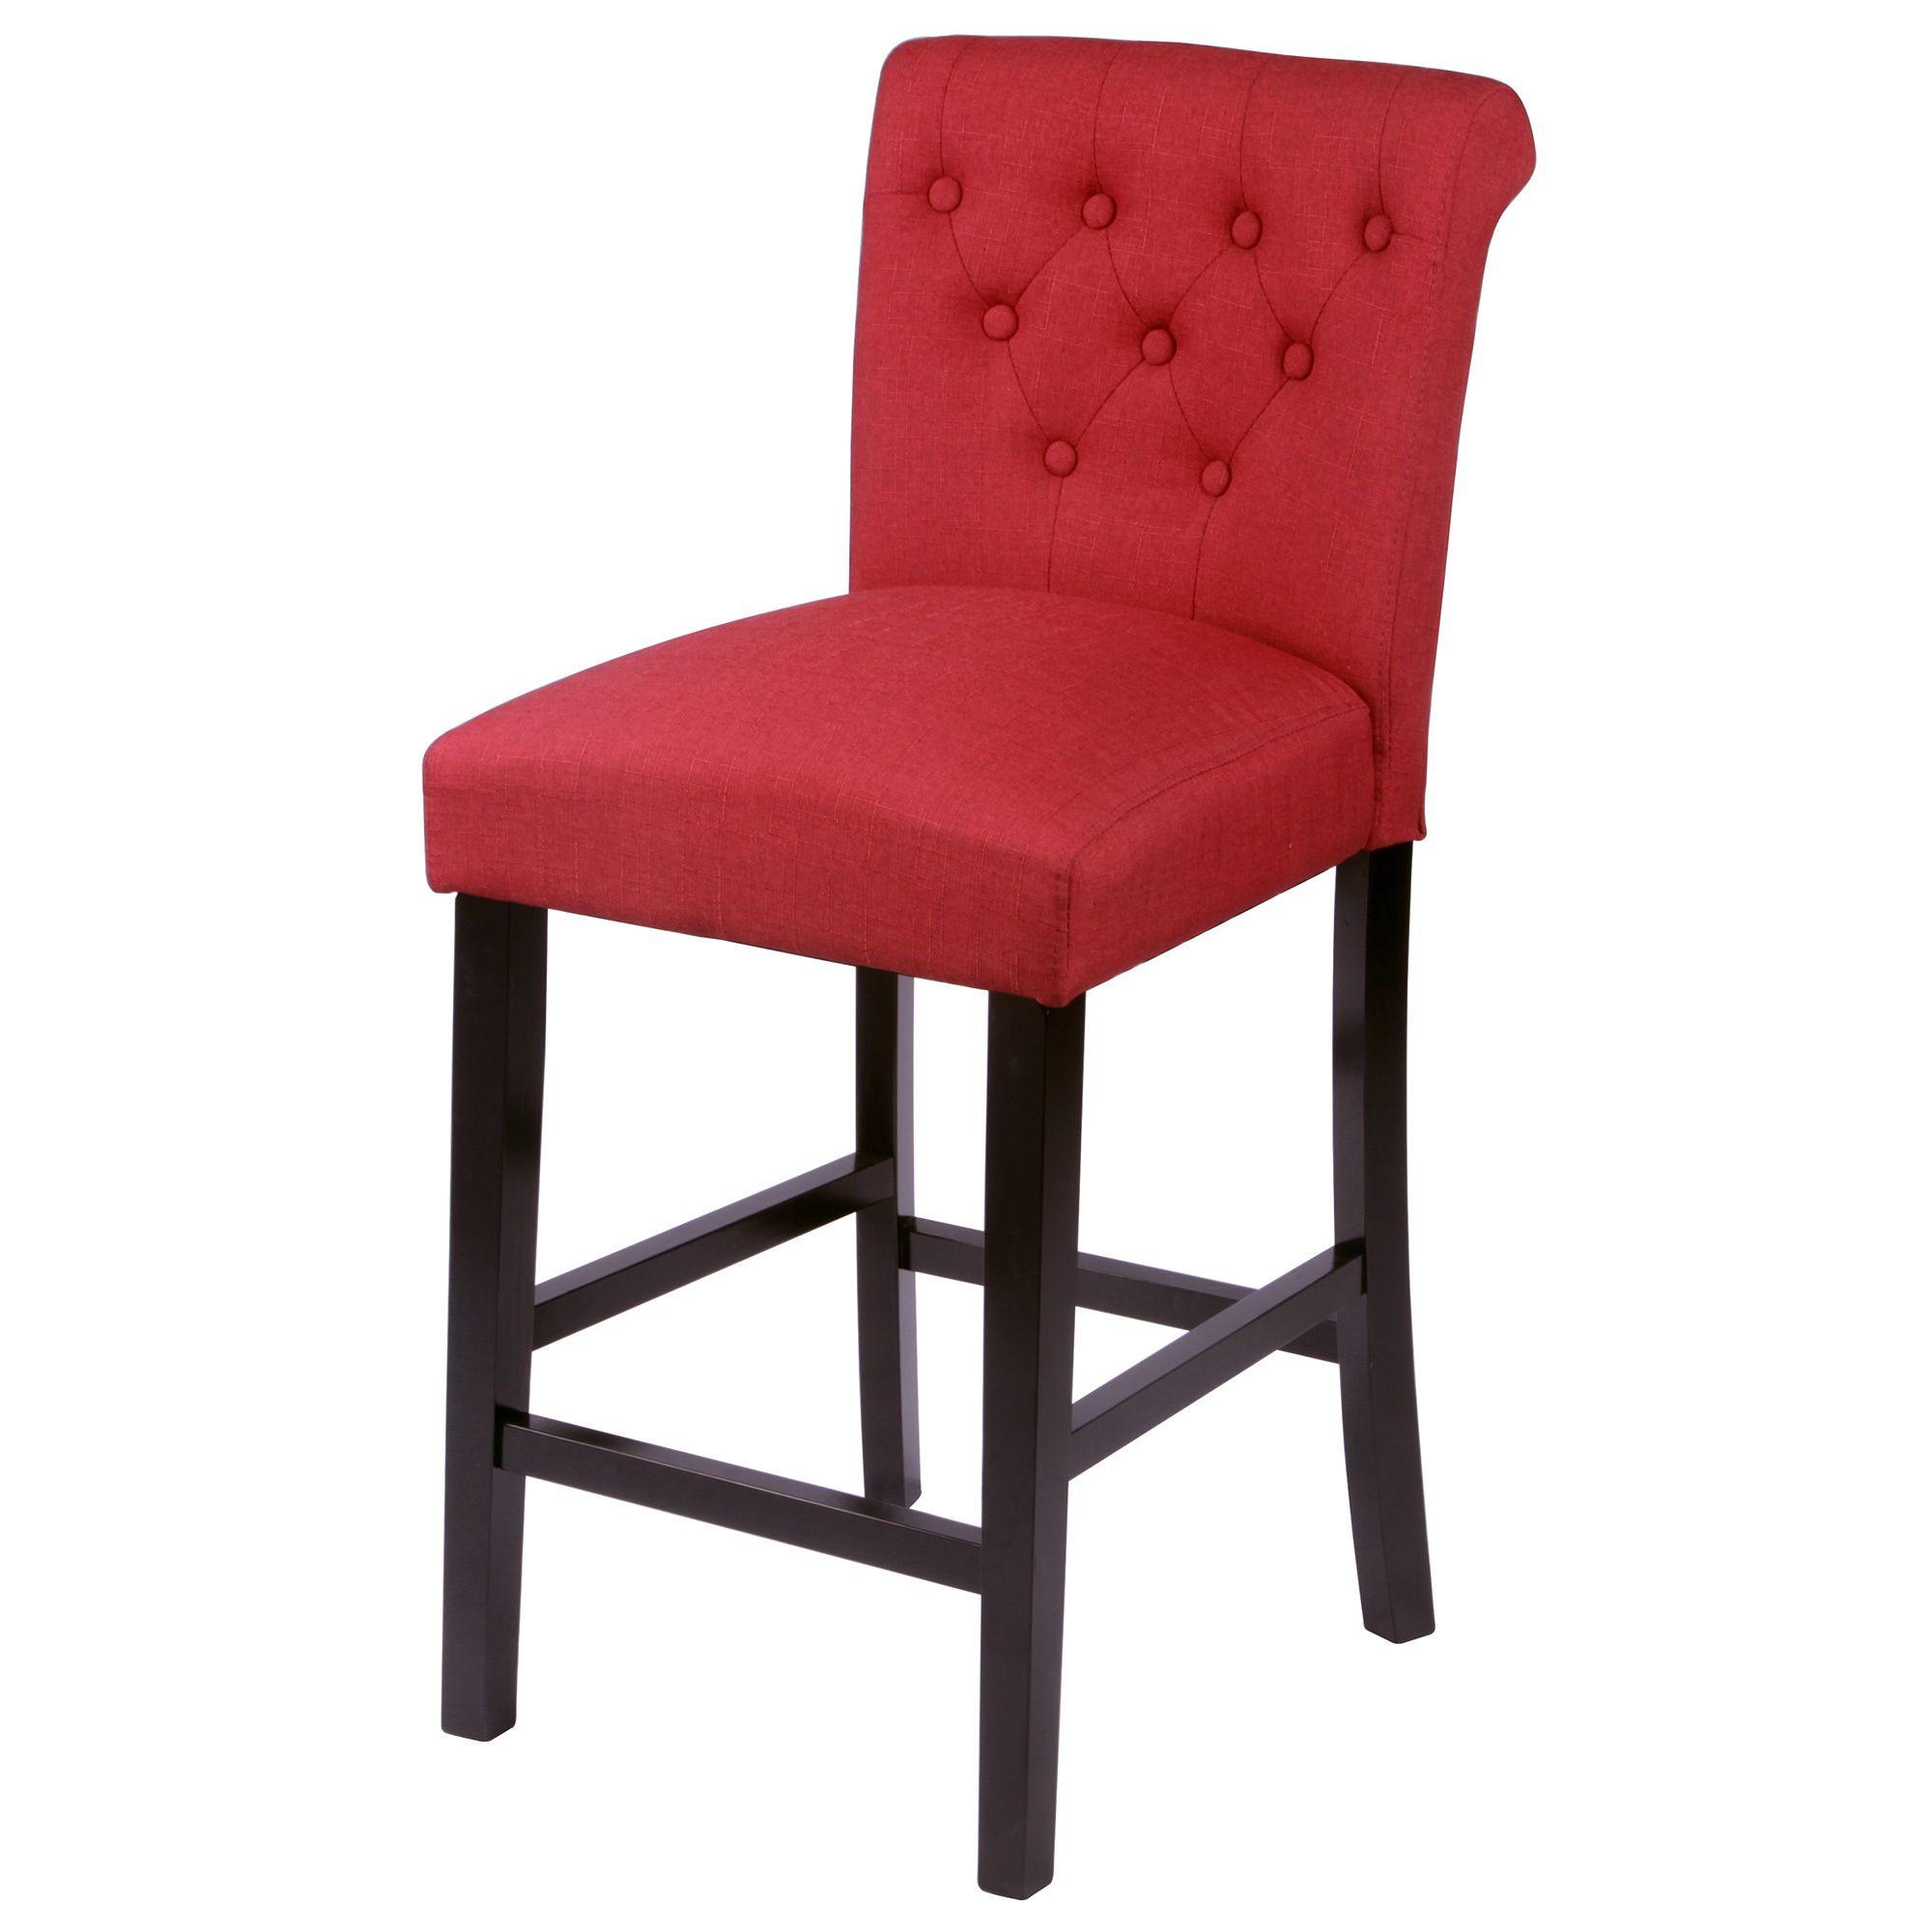 Charmant Monsoon Sopri Upholstered Counter Chairs (Set Of 2) (Sopri Deep Red Counter  Chairs